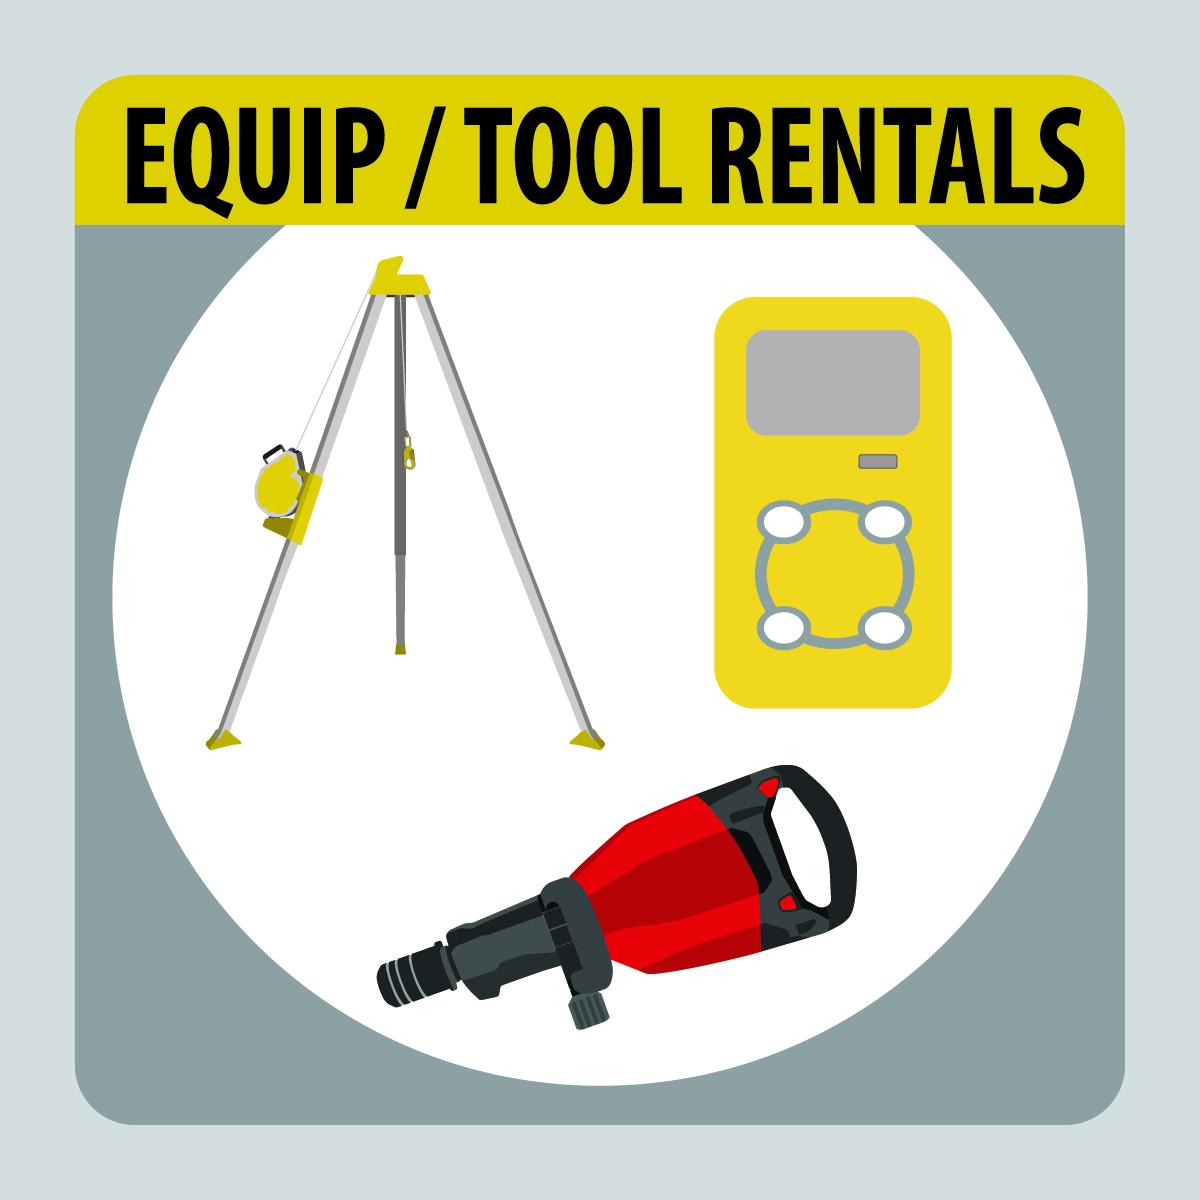 Equip / Tool Rental